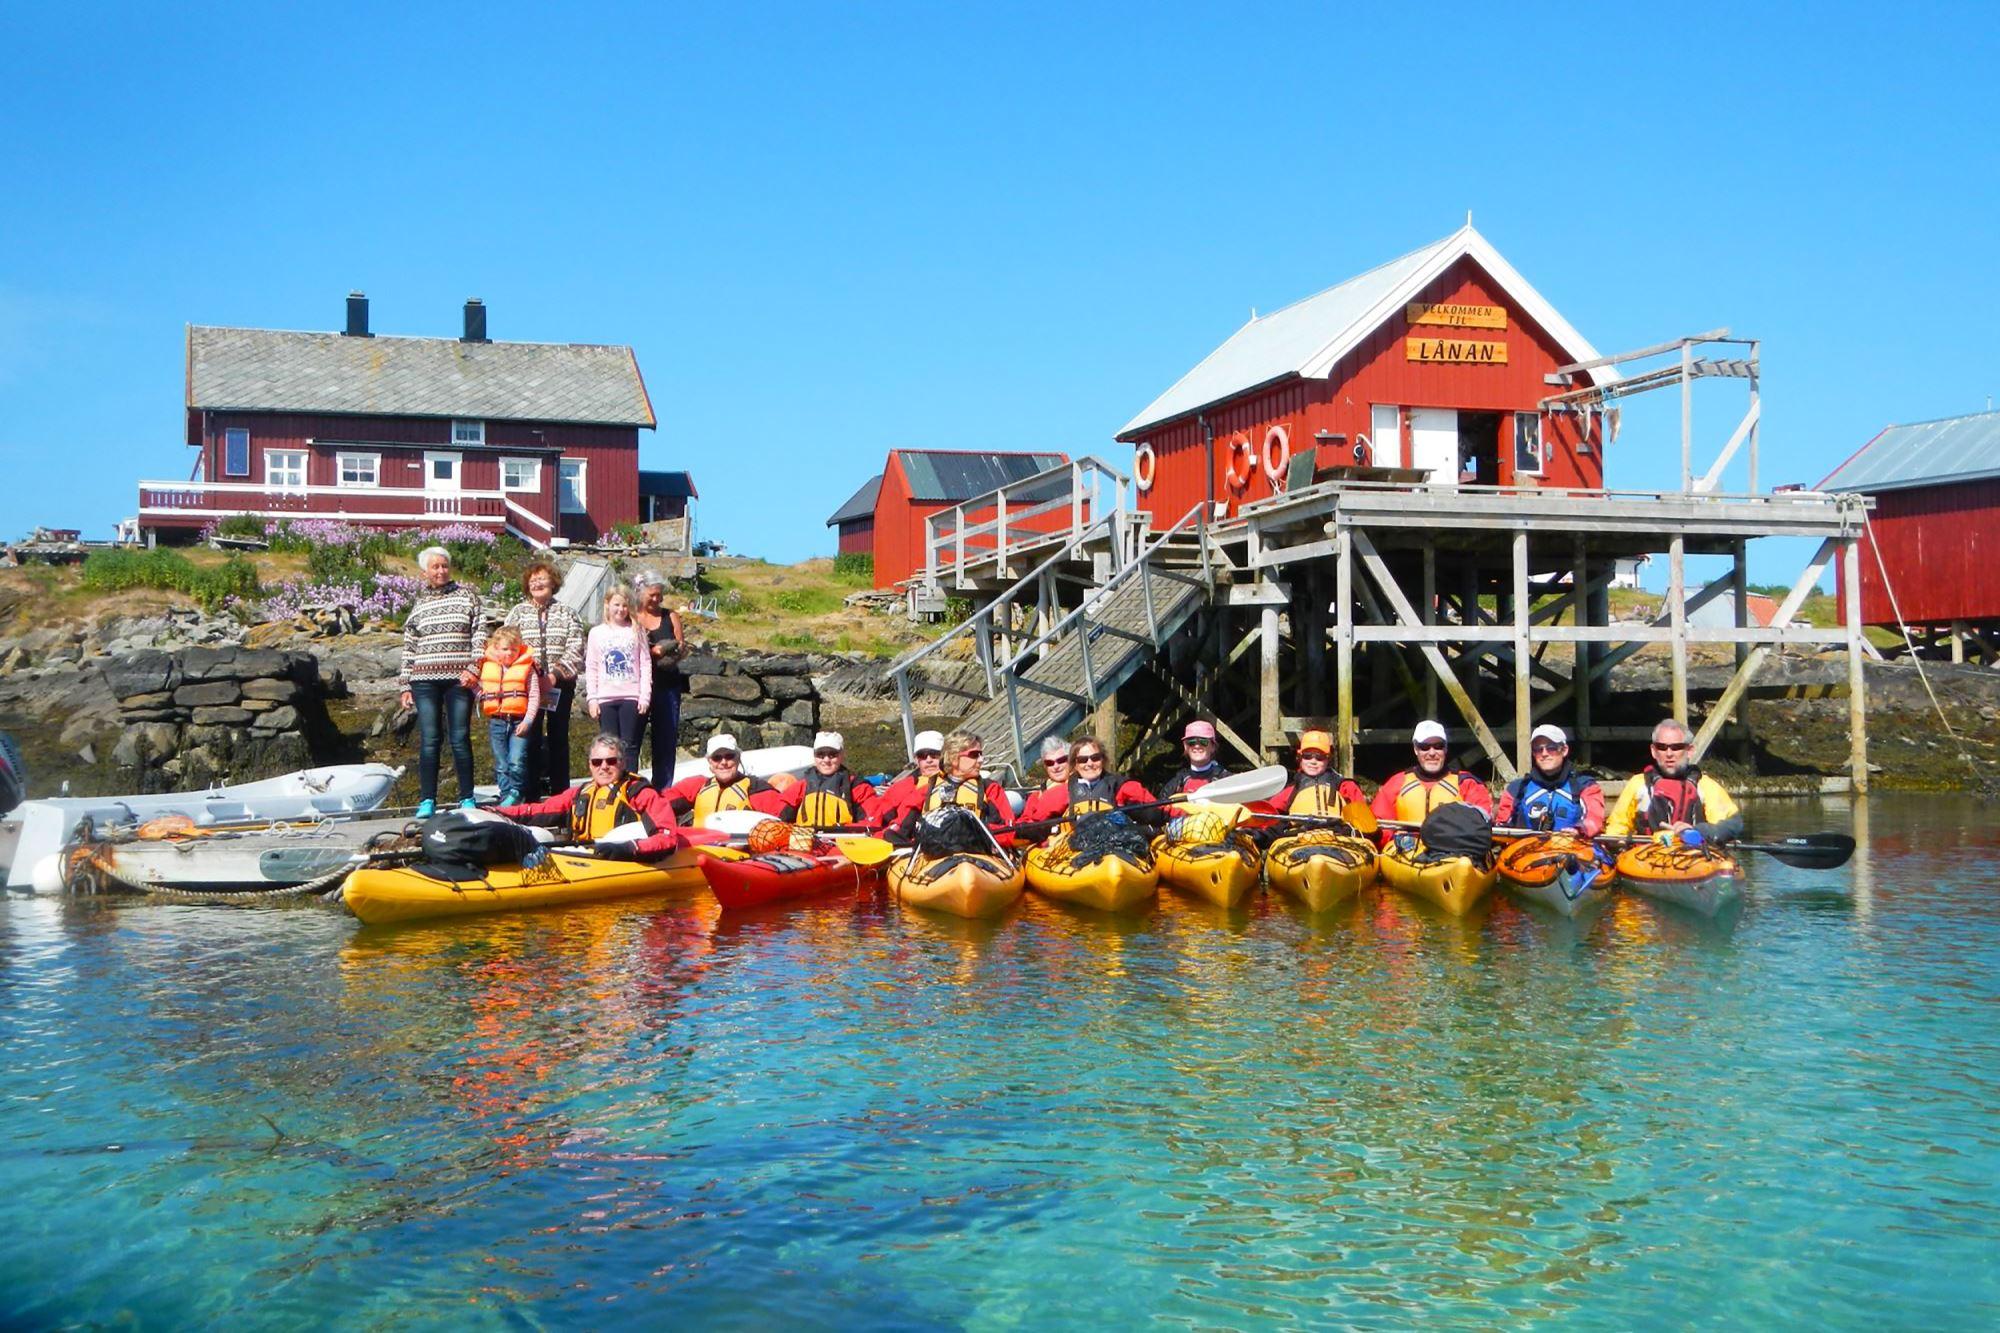 Tømmervika Adventure Centre